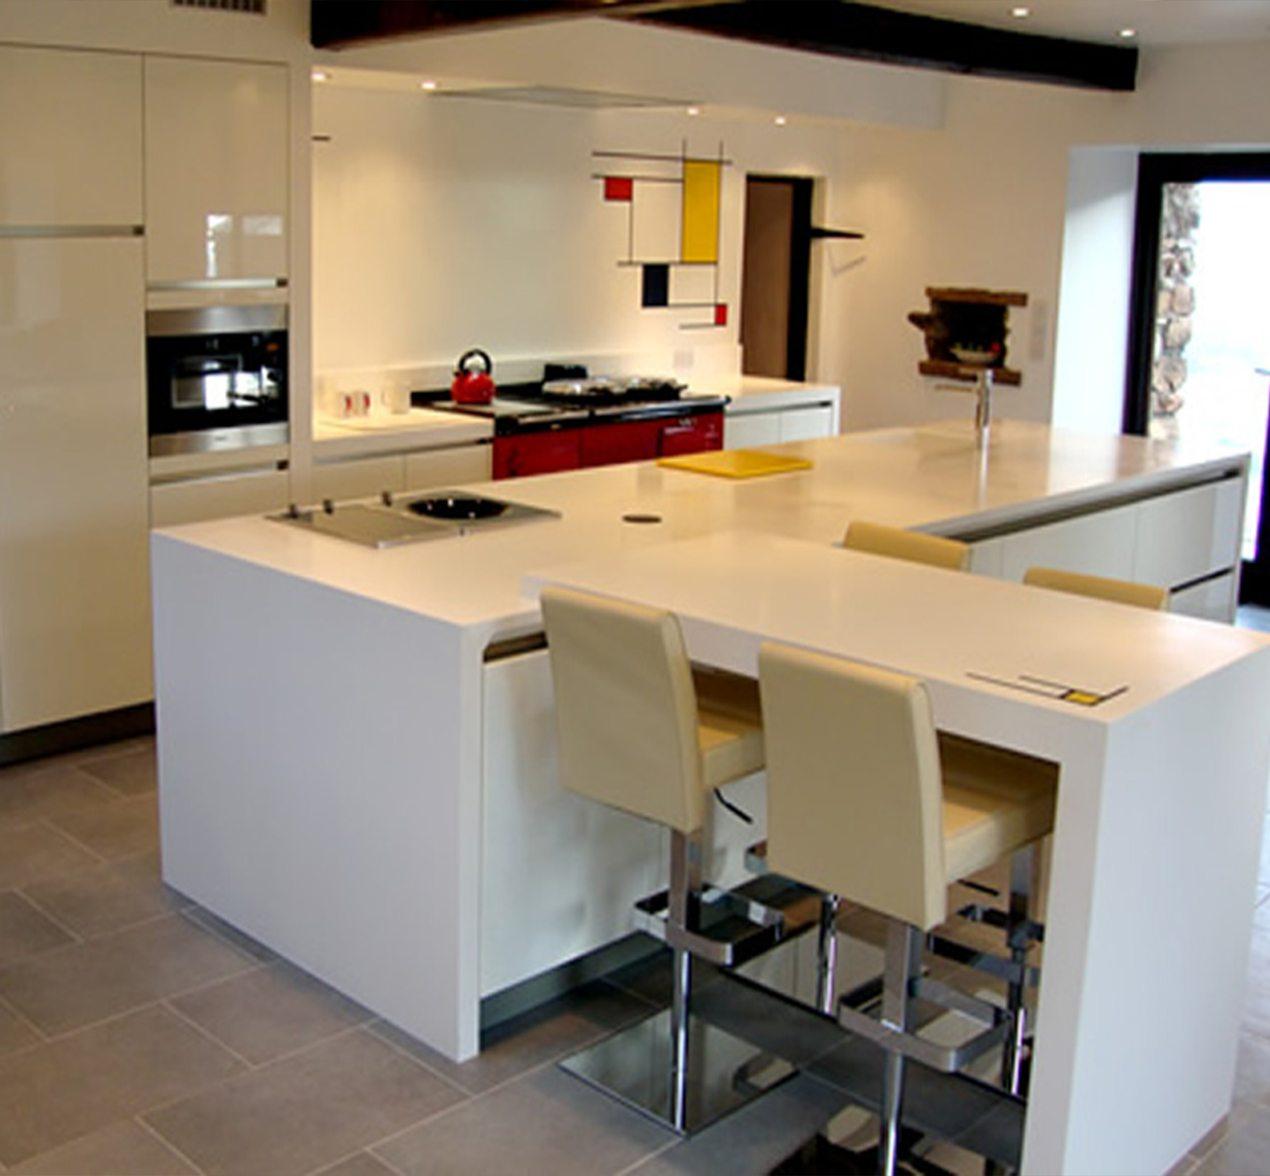 Unique kitchen furniture Filing Cabinet Unique Kitchen Project In The Lake District Reinvents The Famous Style Of Dutch Artist Piet Mondrian Kitchen Design Centre Unique Lake District Kitchen Design Kitchen Design Centre